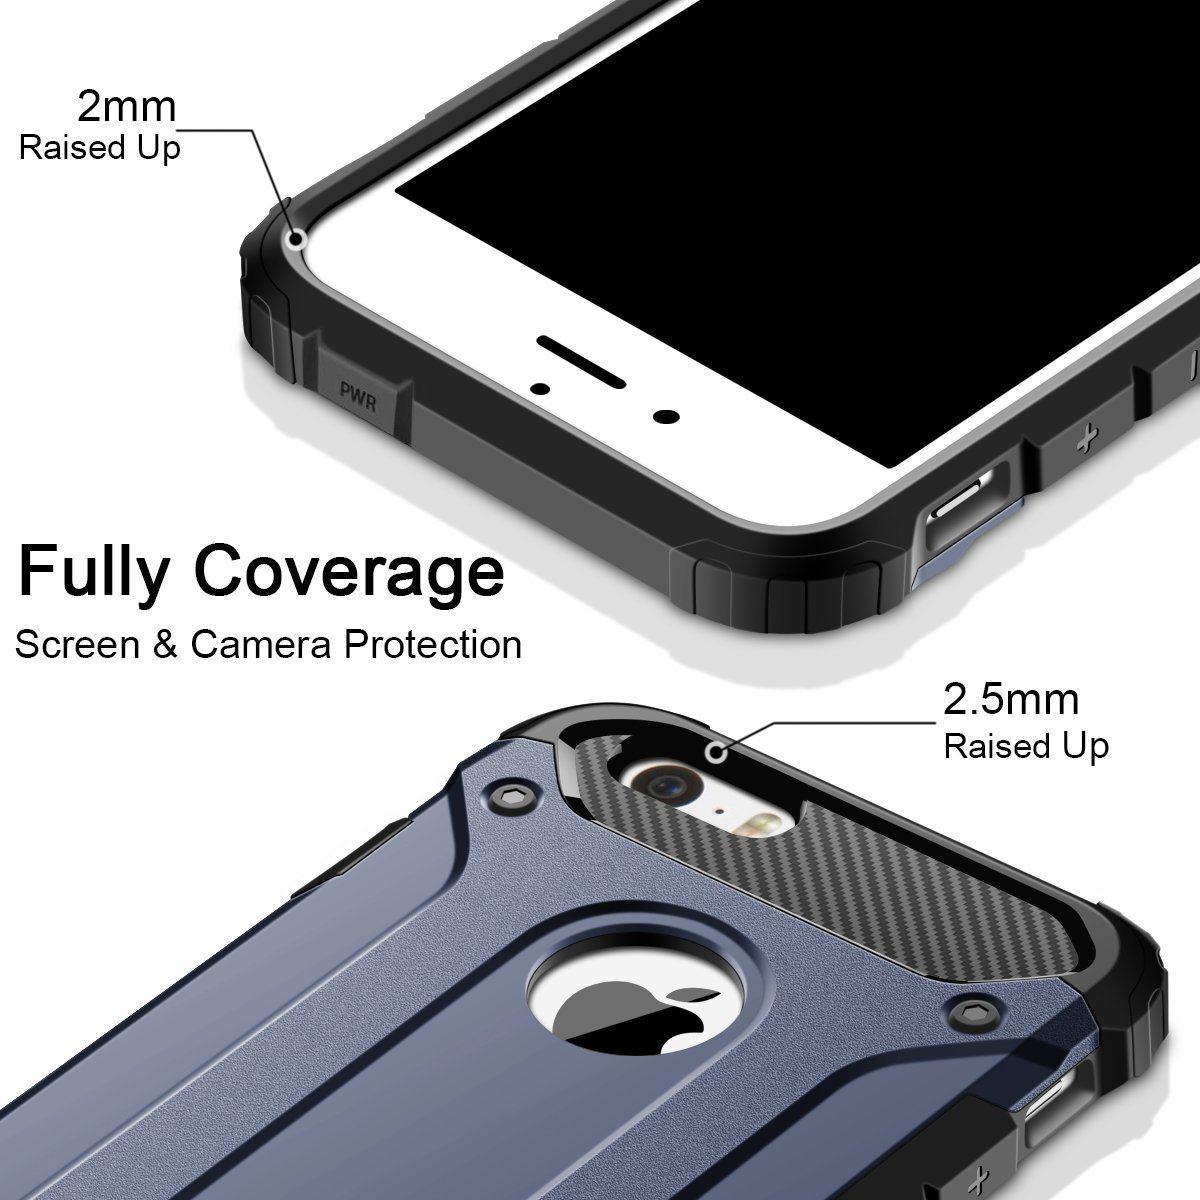 thumbnail 40 - For Apple iPhone 11 Pro Max XR Xs X 8 7 Plus 6 5 Se Case Cover Tough Armor